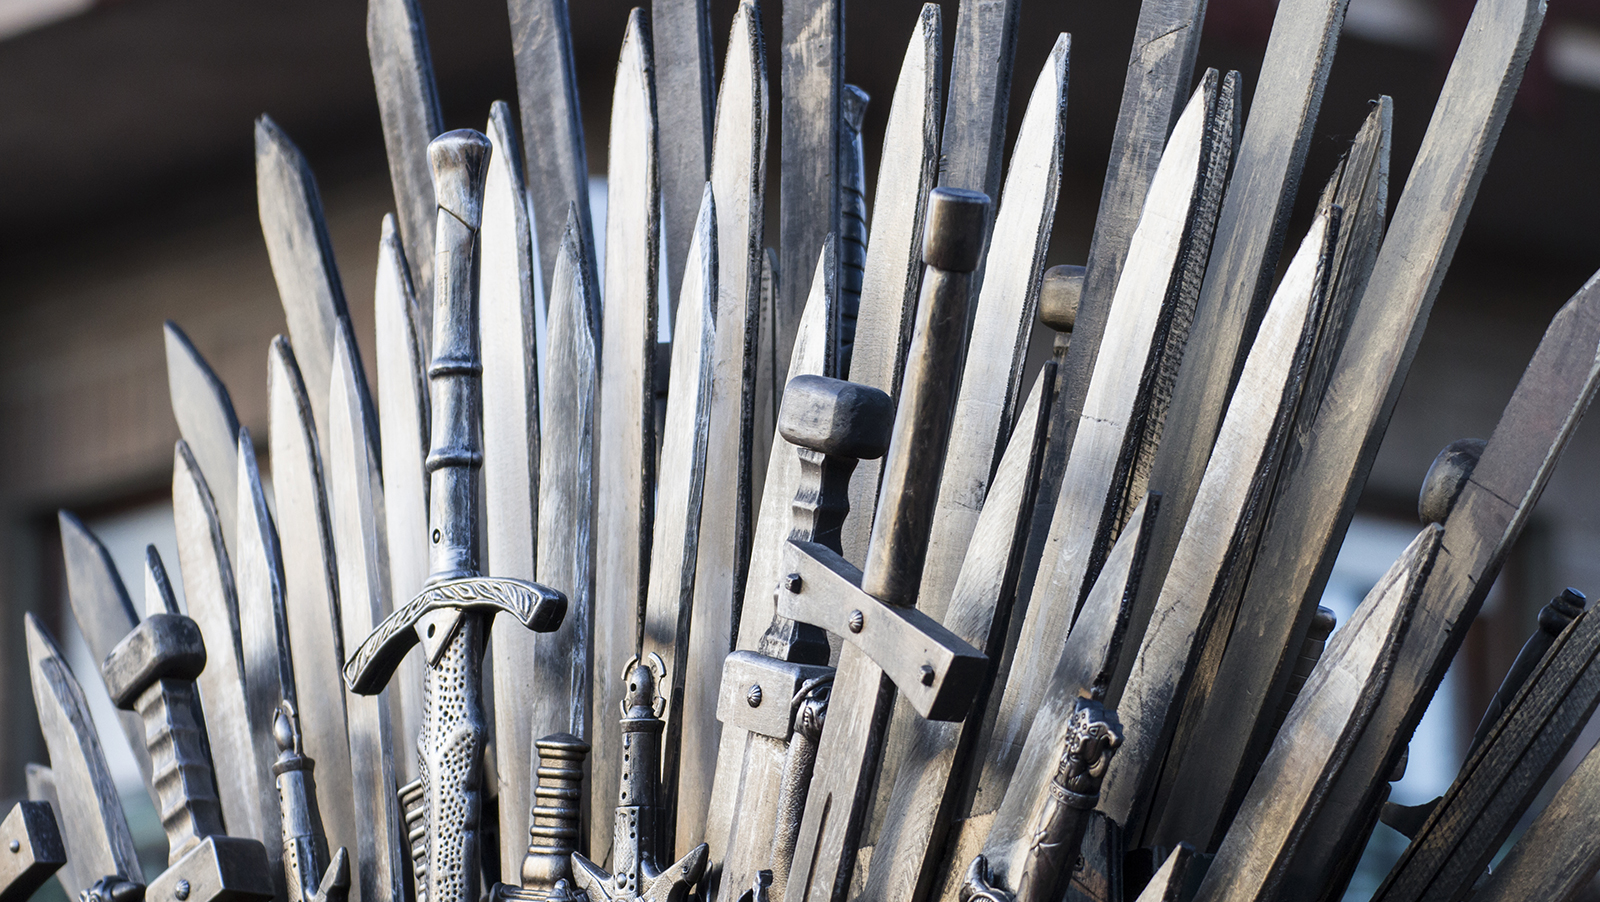 Game of Thrones odds: Will Jon Snow kill Daenerys?